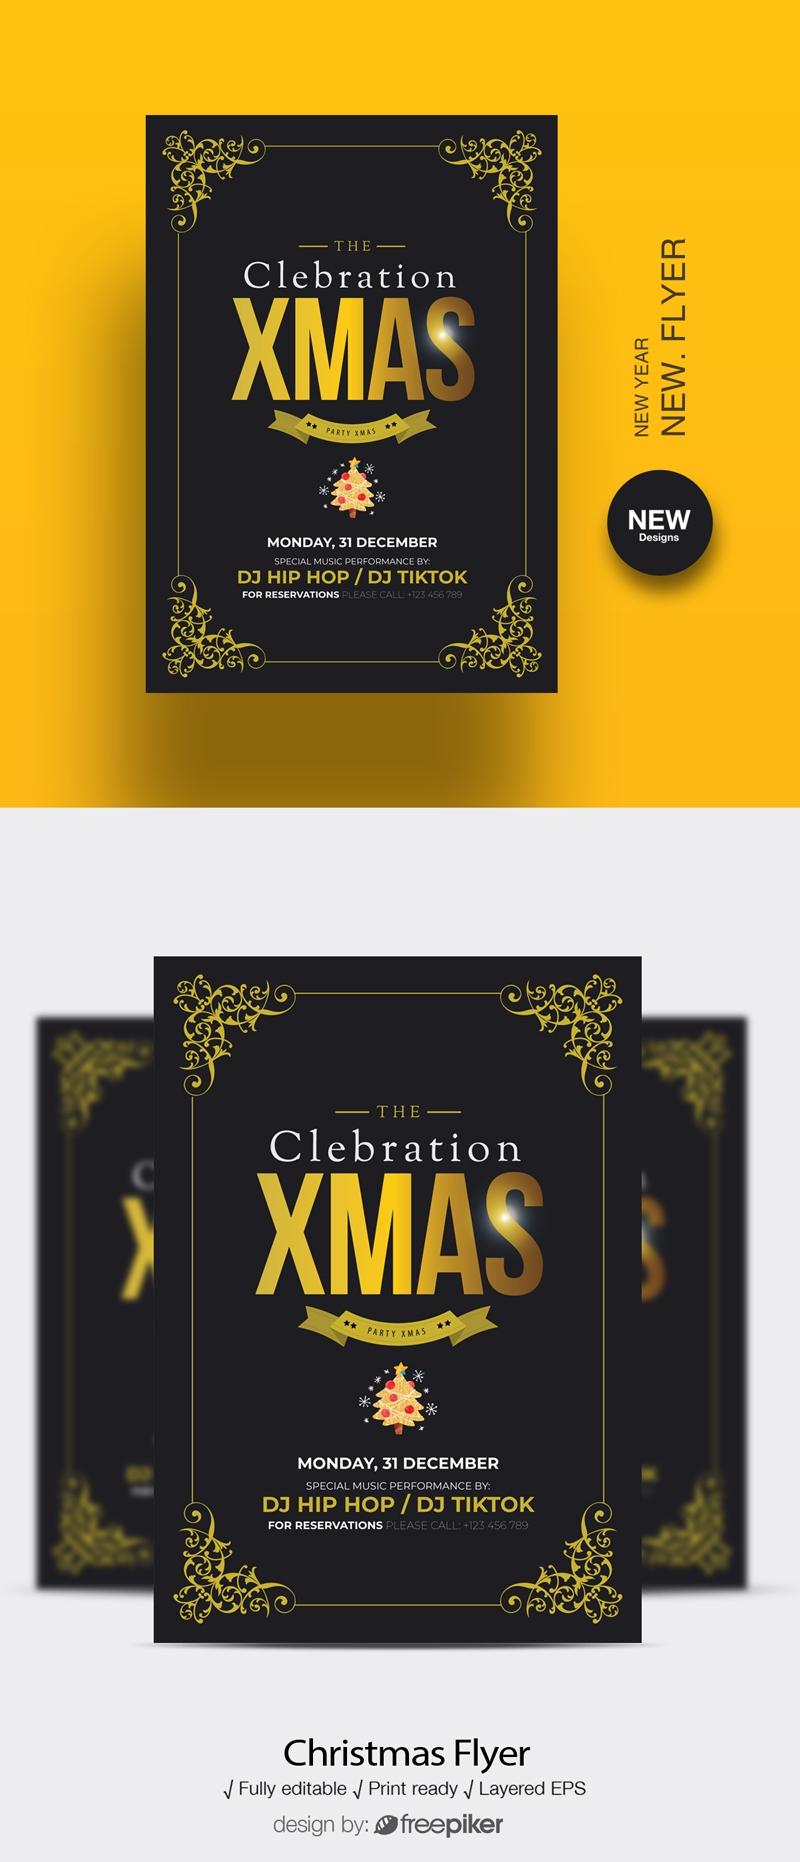 Celebrations Christmas Flyer Template